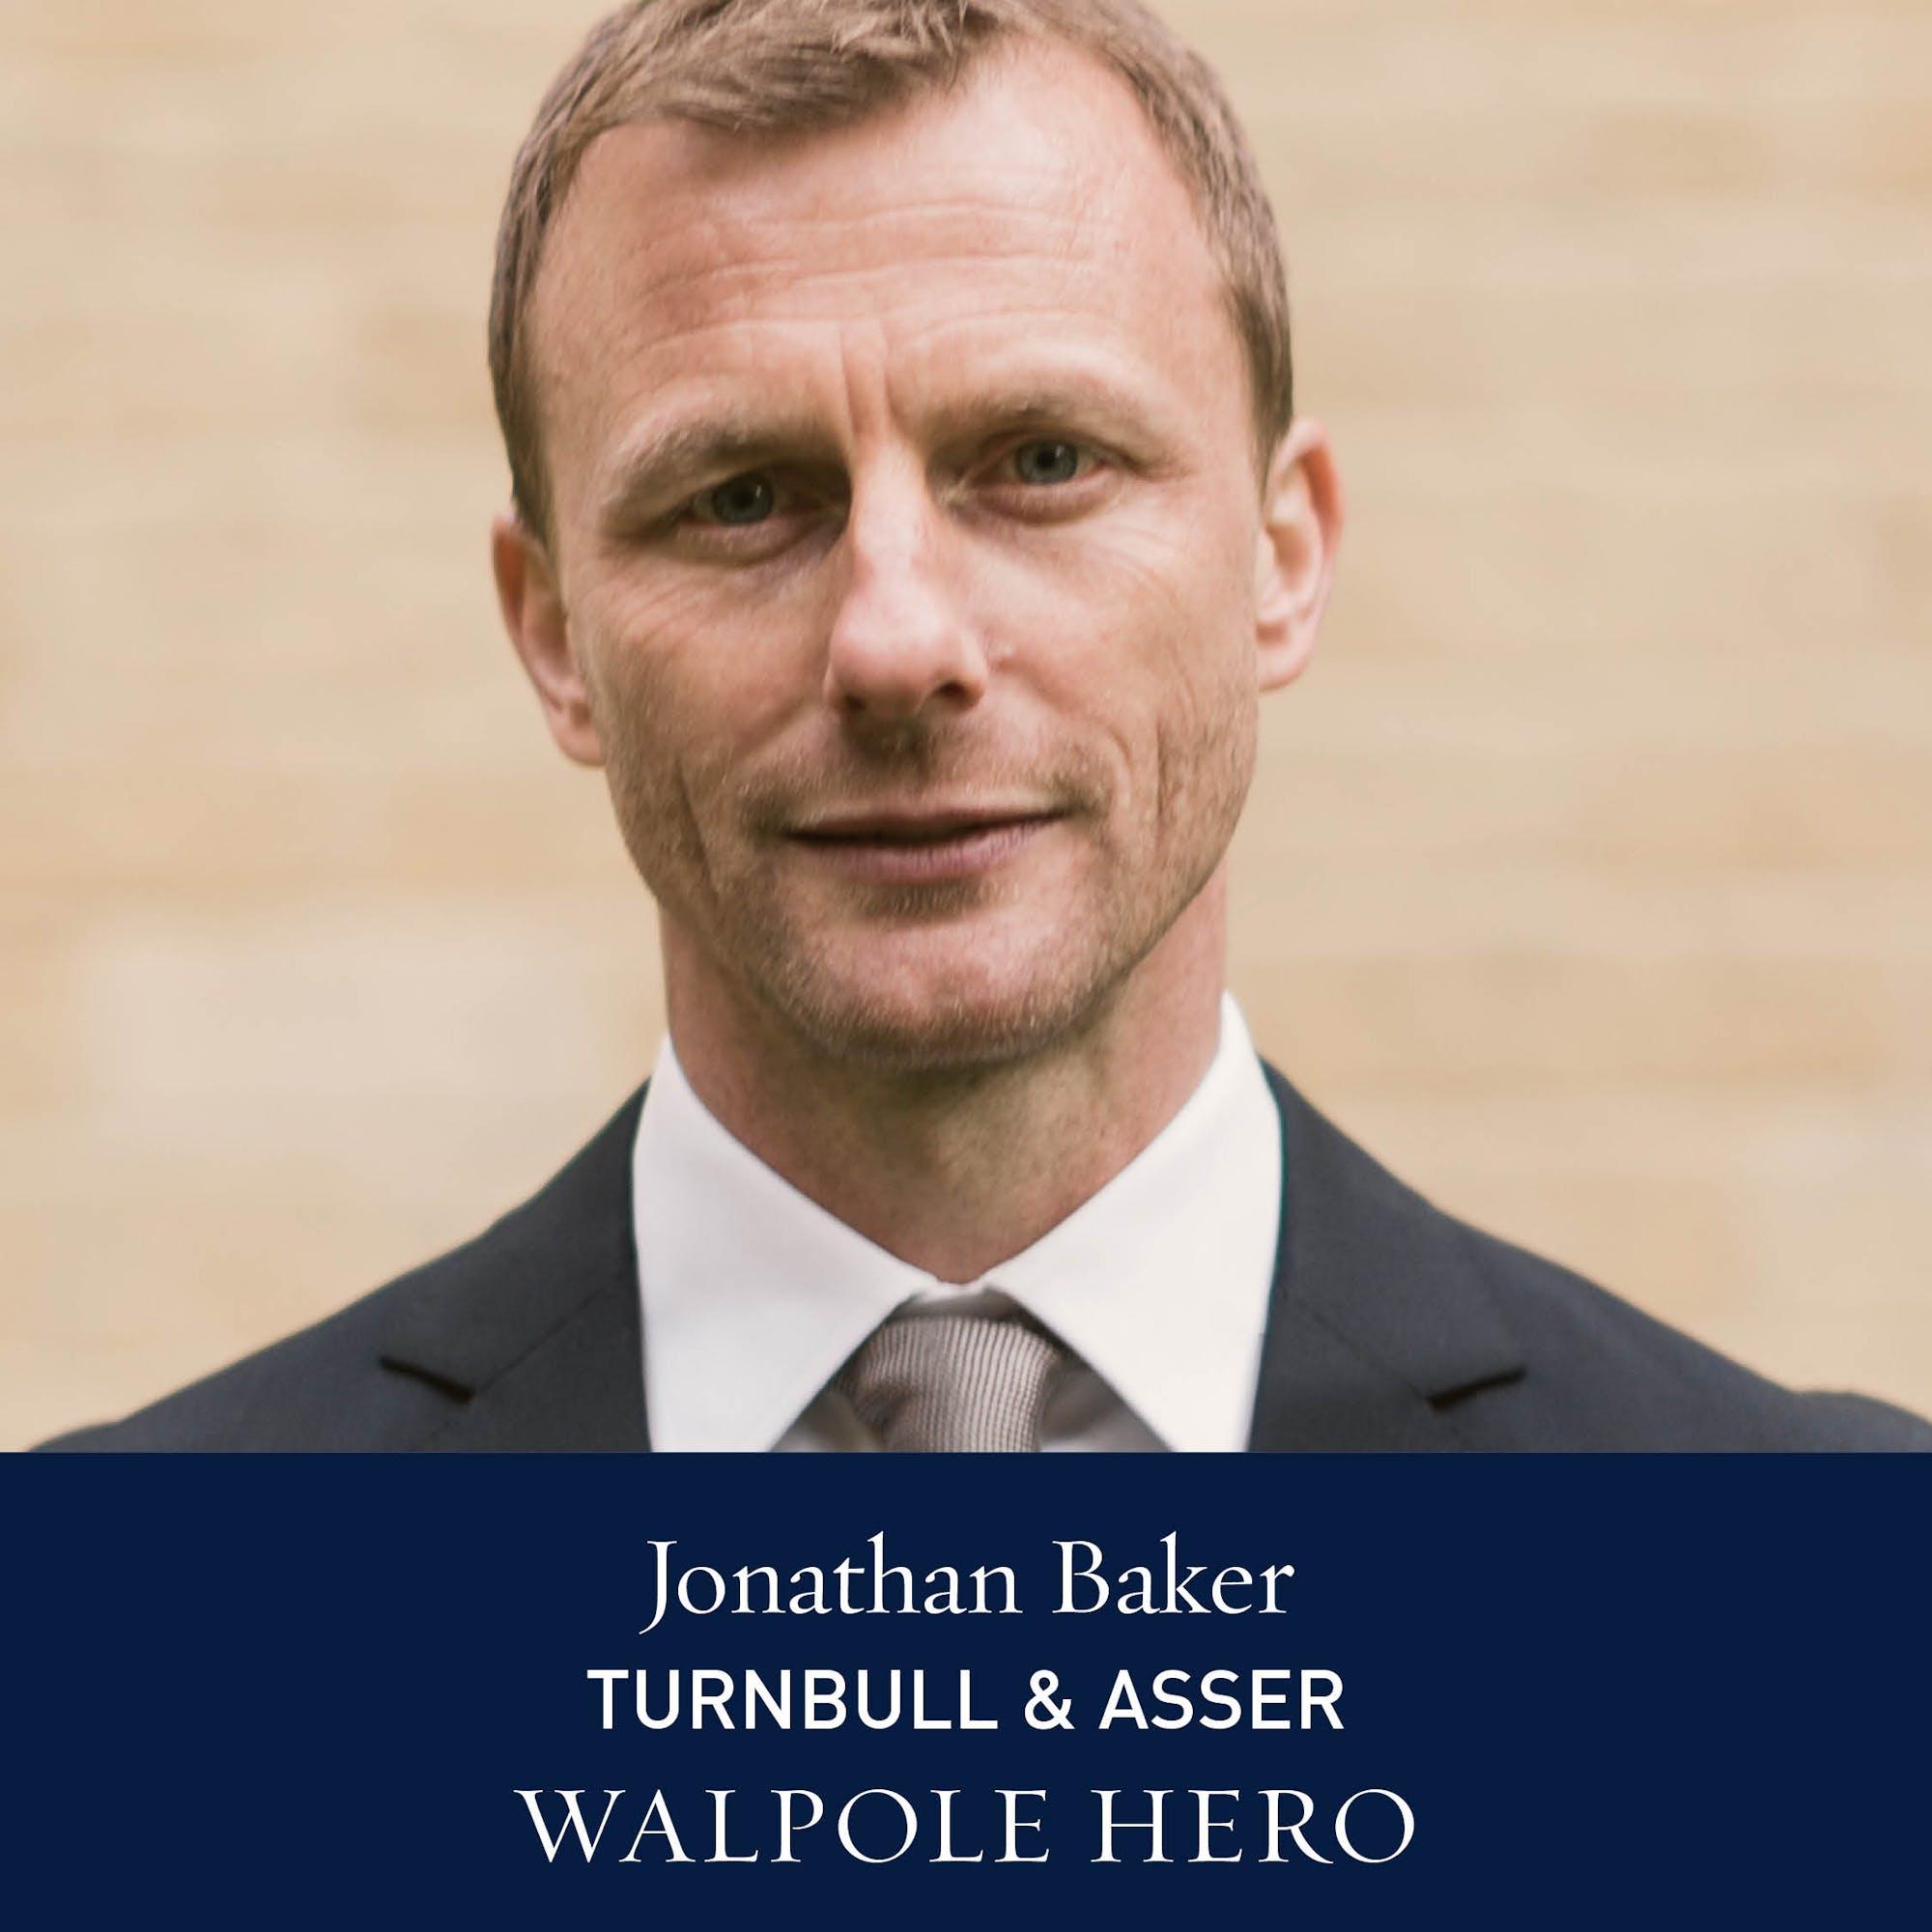 The Walpole Power List  The Heroes: Jonathan Baker, Managing Director of Turnbull & Asser